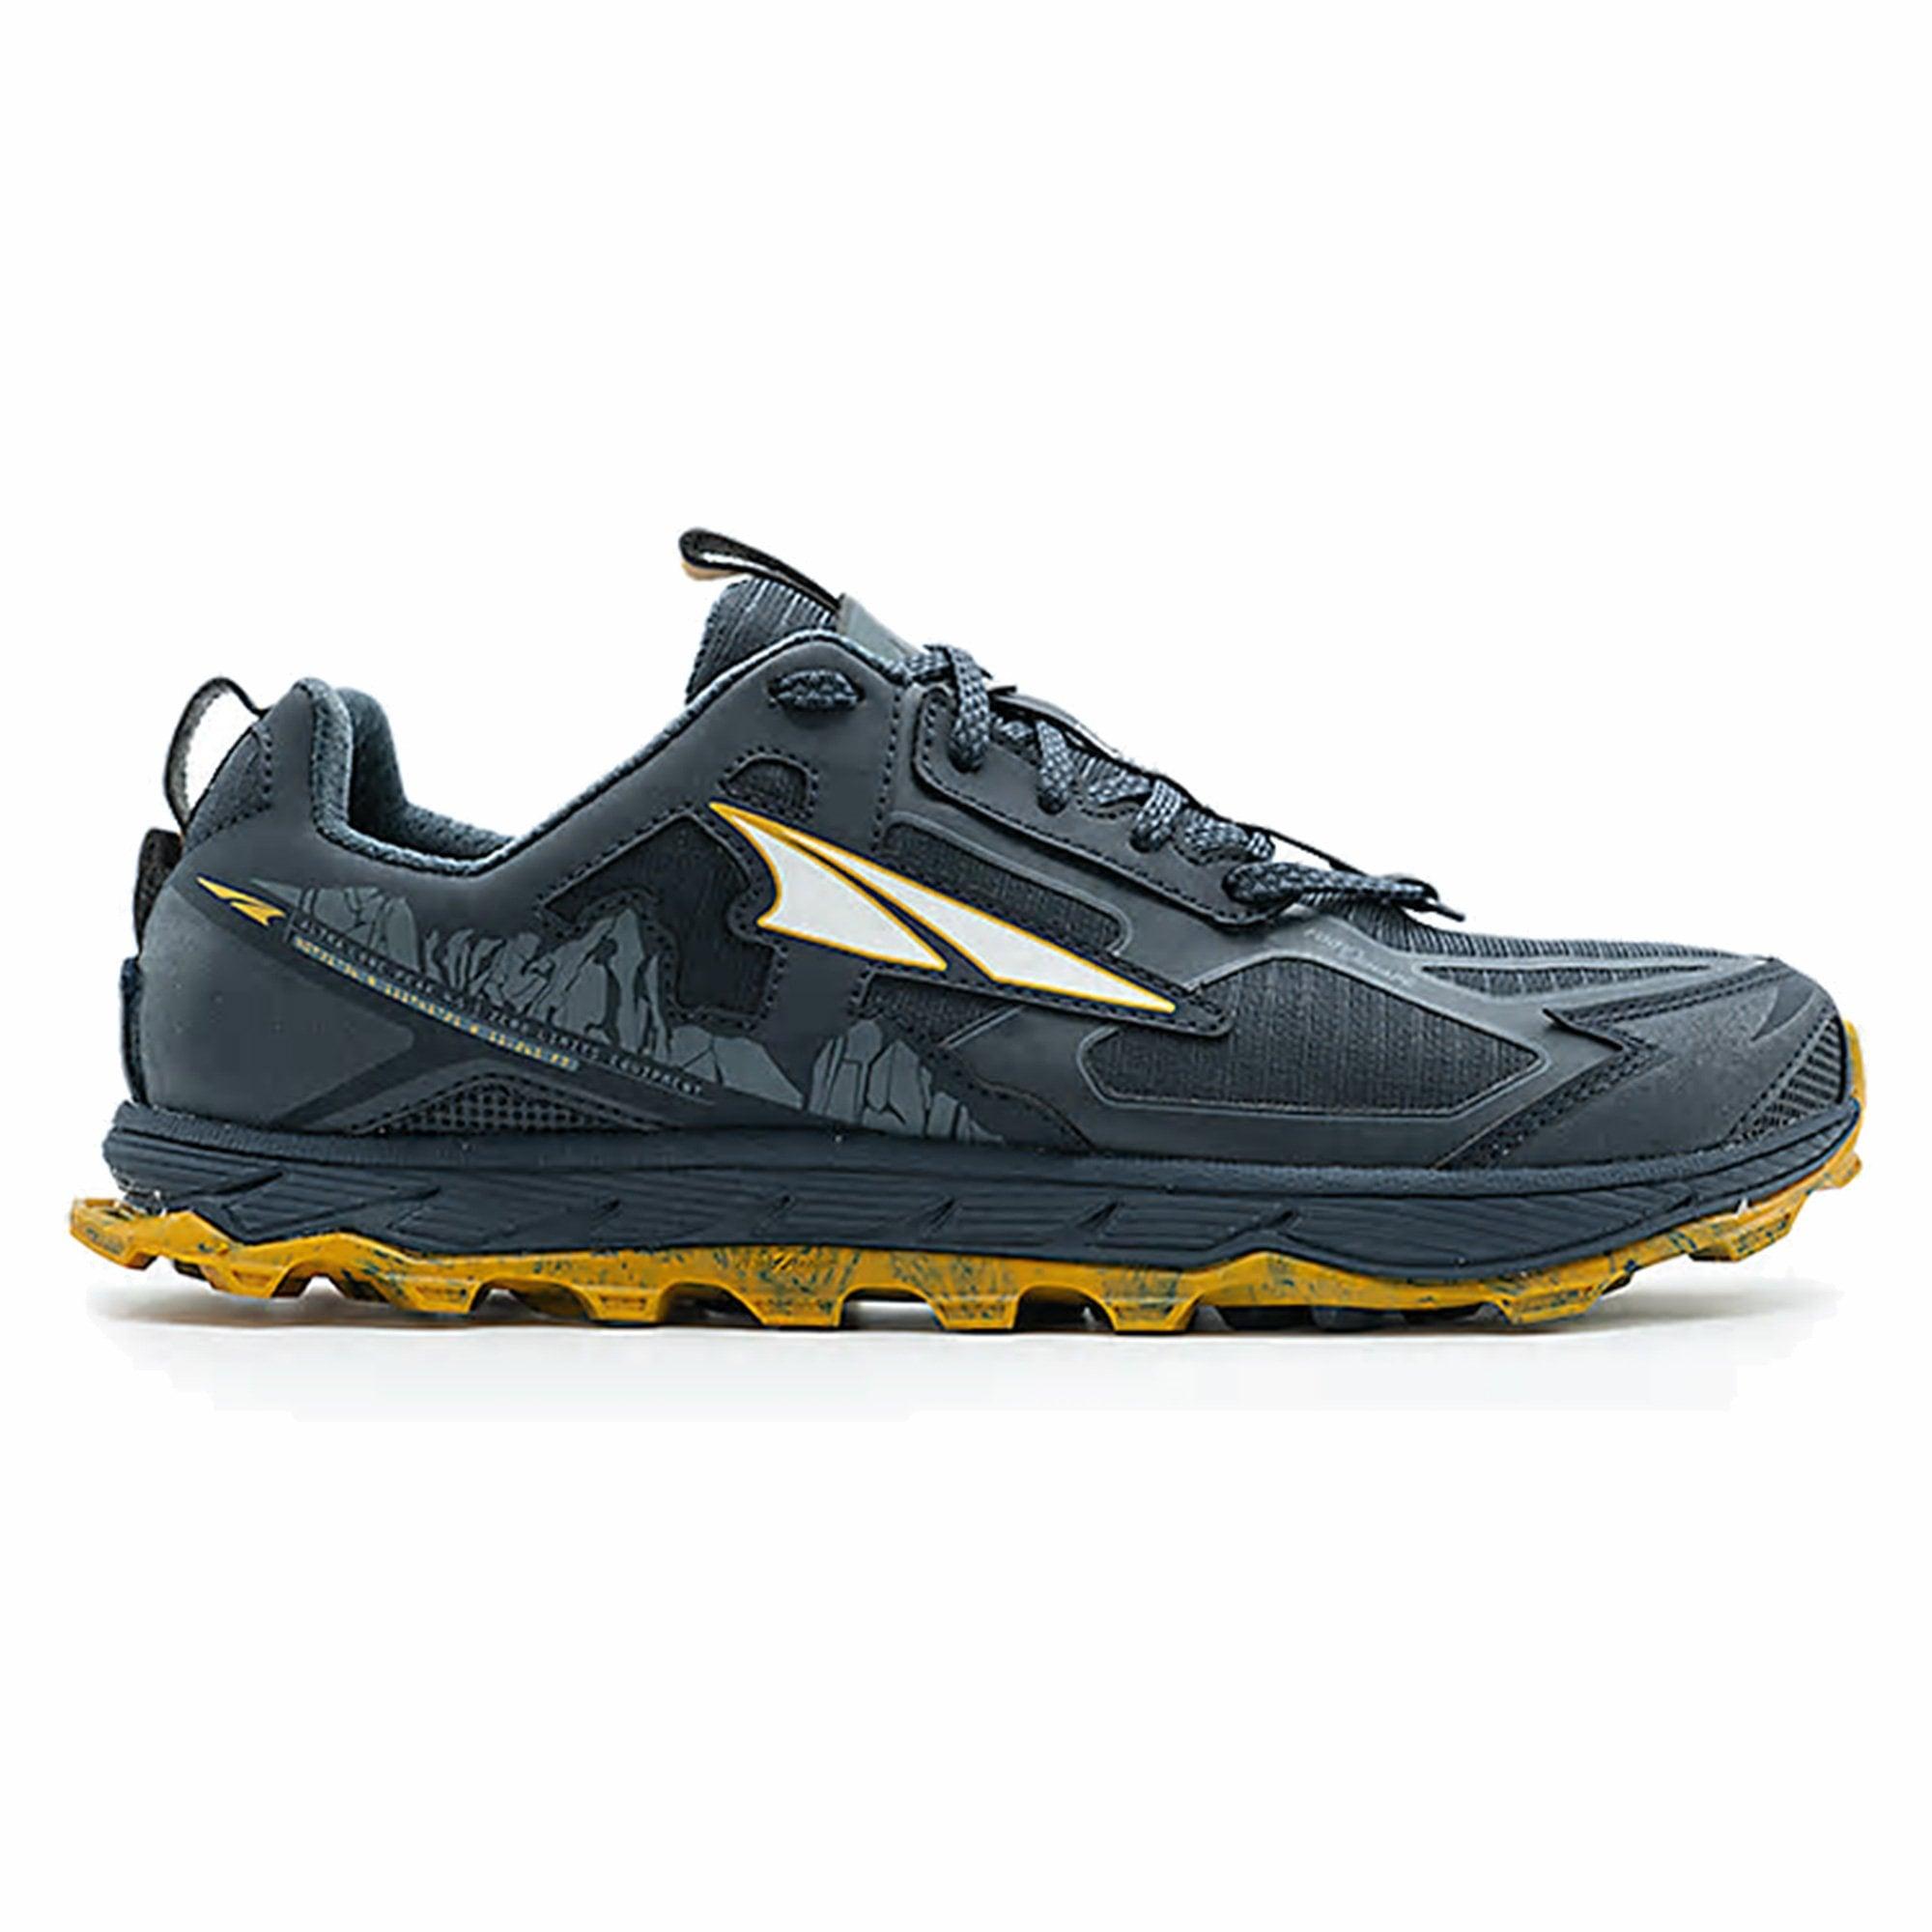 Lone Peak 4 5 Mens Zero Drop Footshape Toe Box Trail Running Shoes Carbon At Northernrunner Com